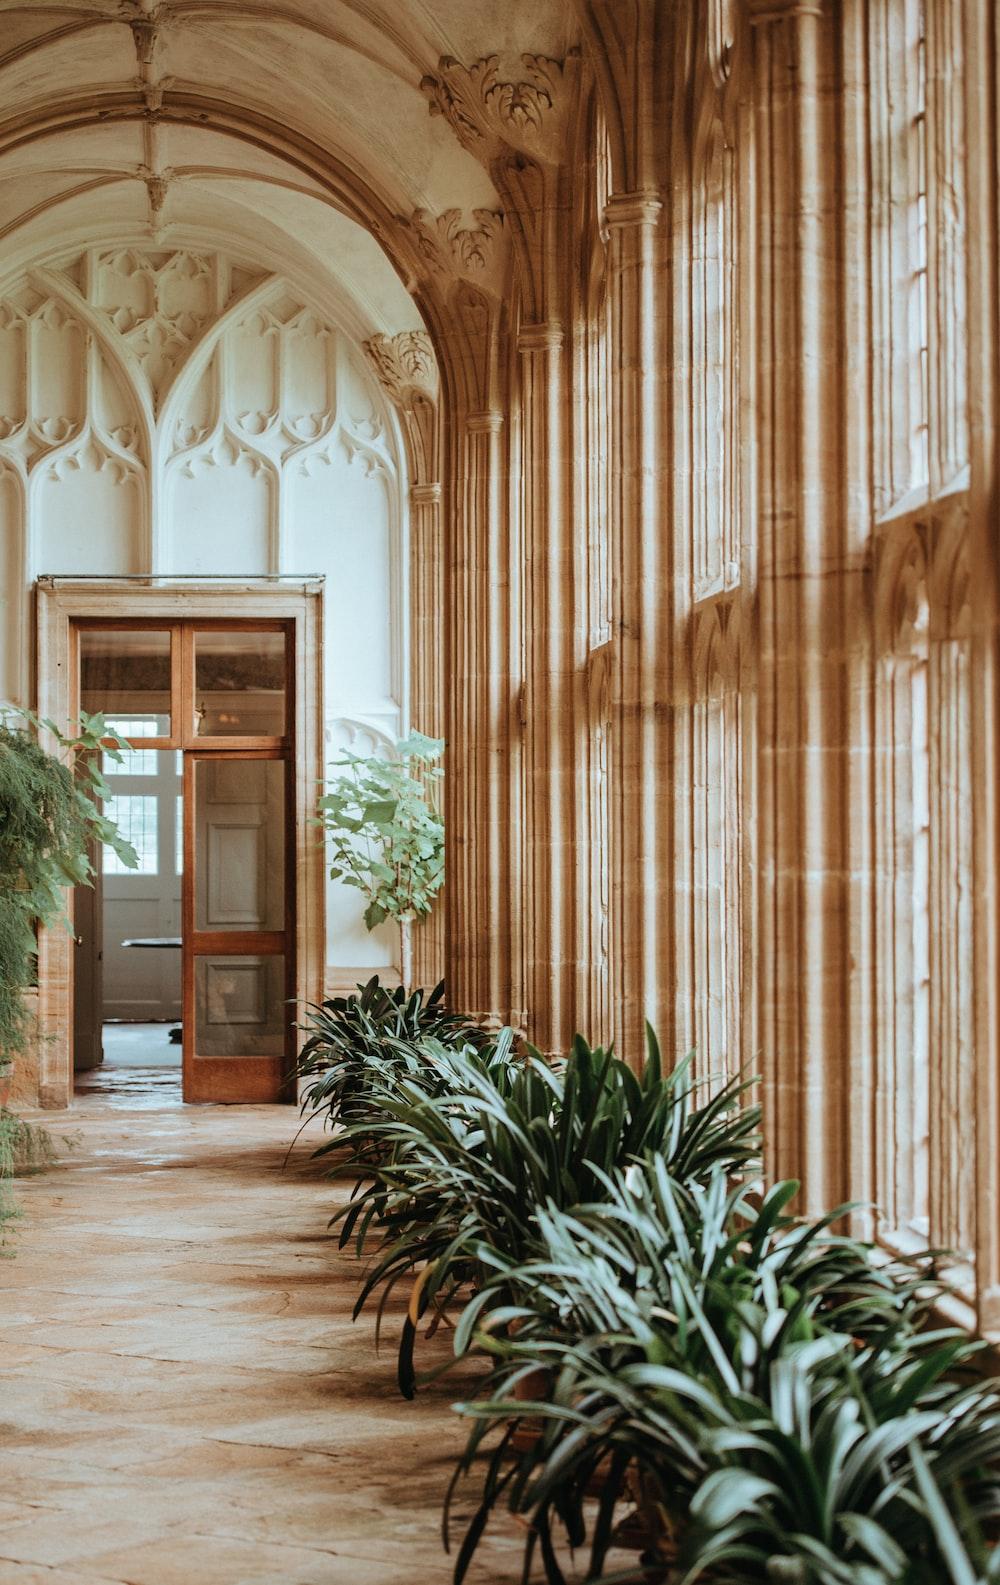 green plant near window towards open door inside the building